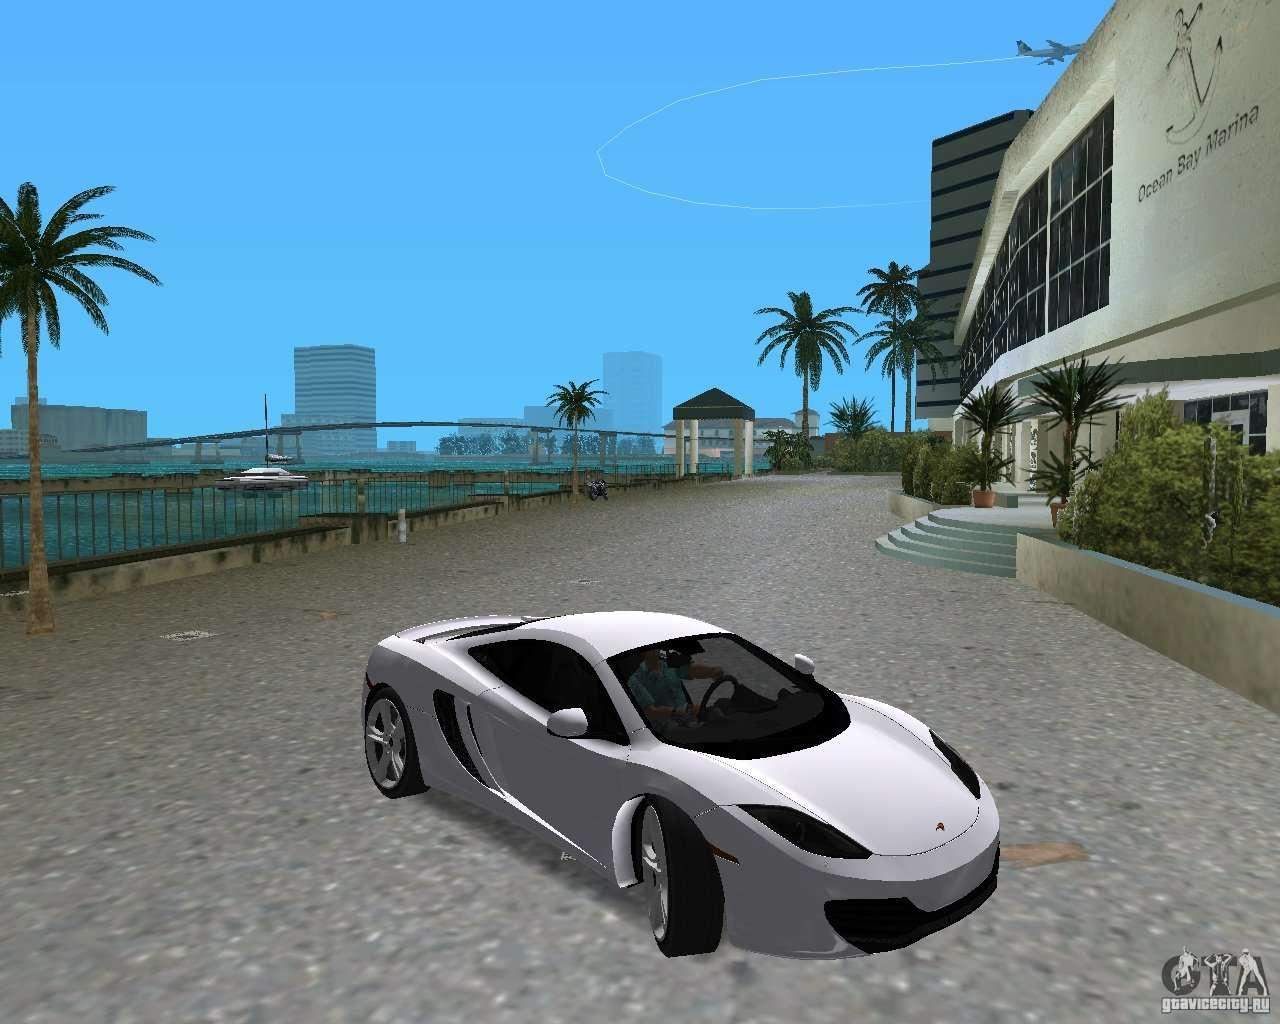 vice city xxxtentacion mp4 download